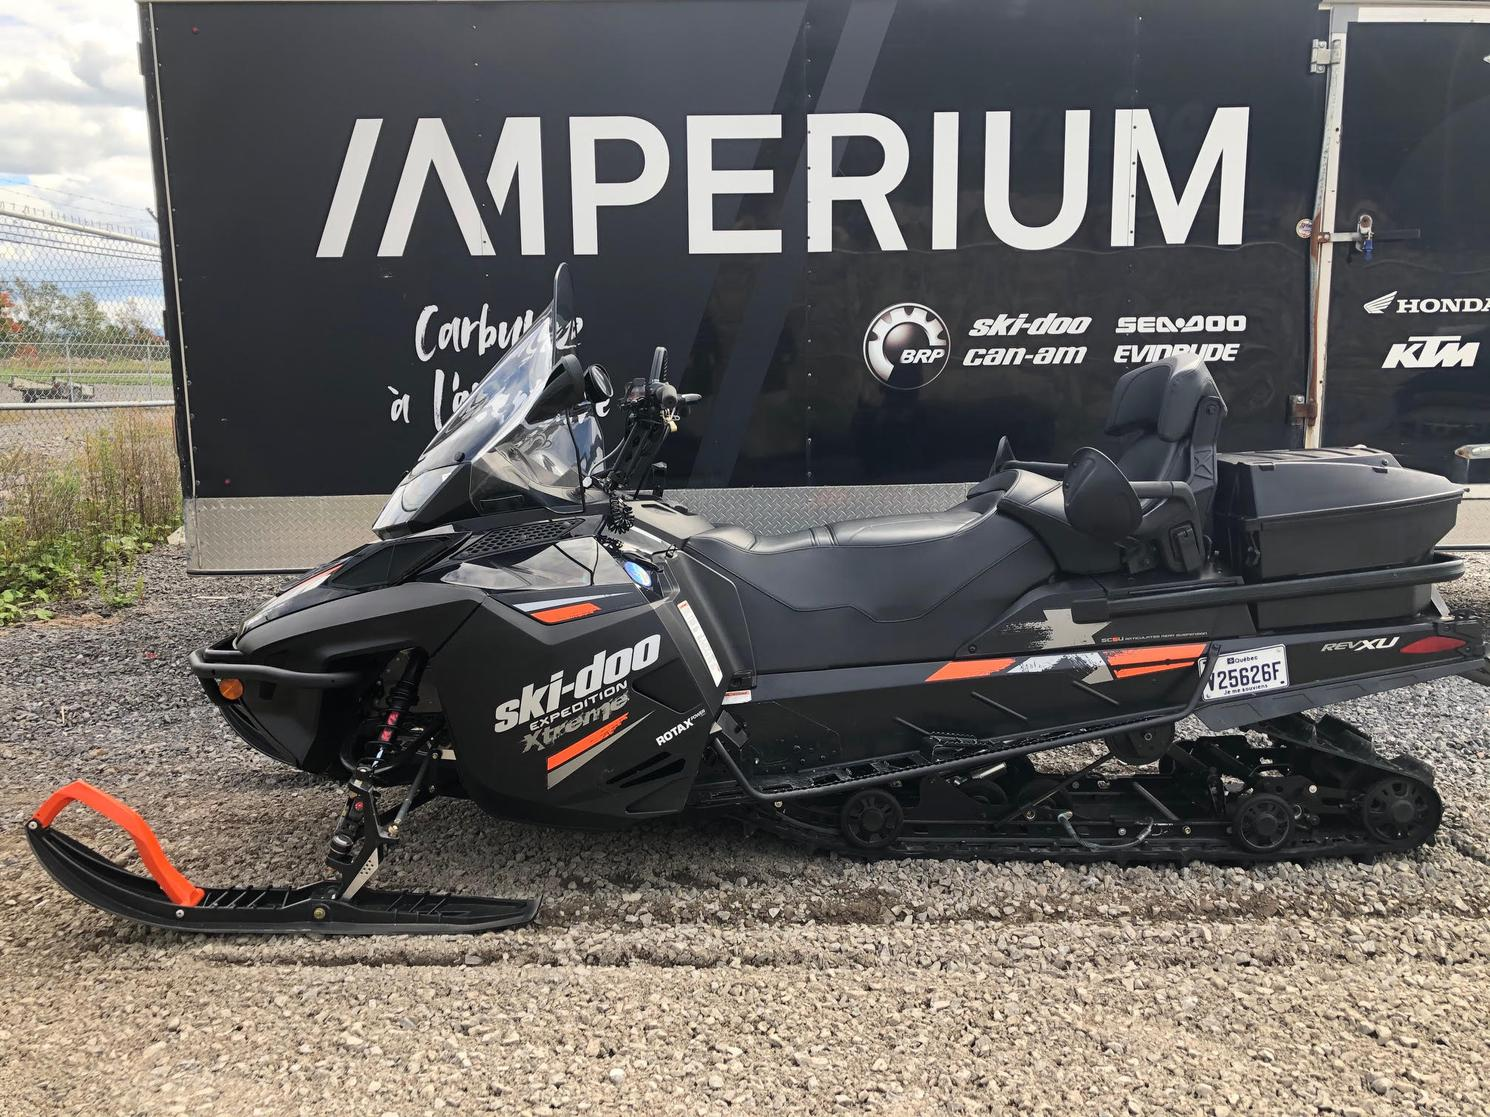 41164 Ski-Doo Expedition Xtreme 800R 2018